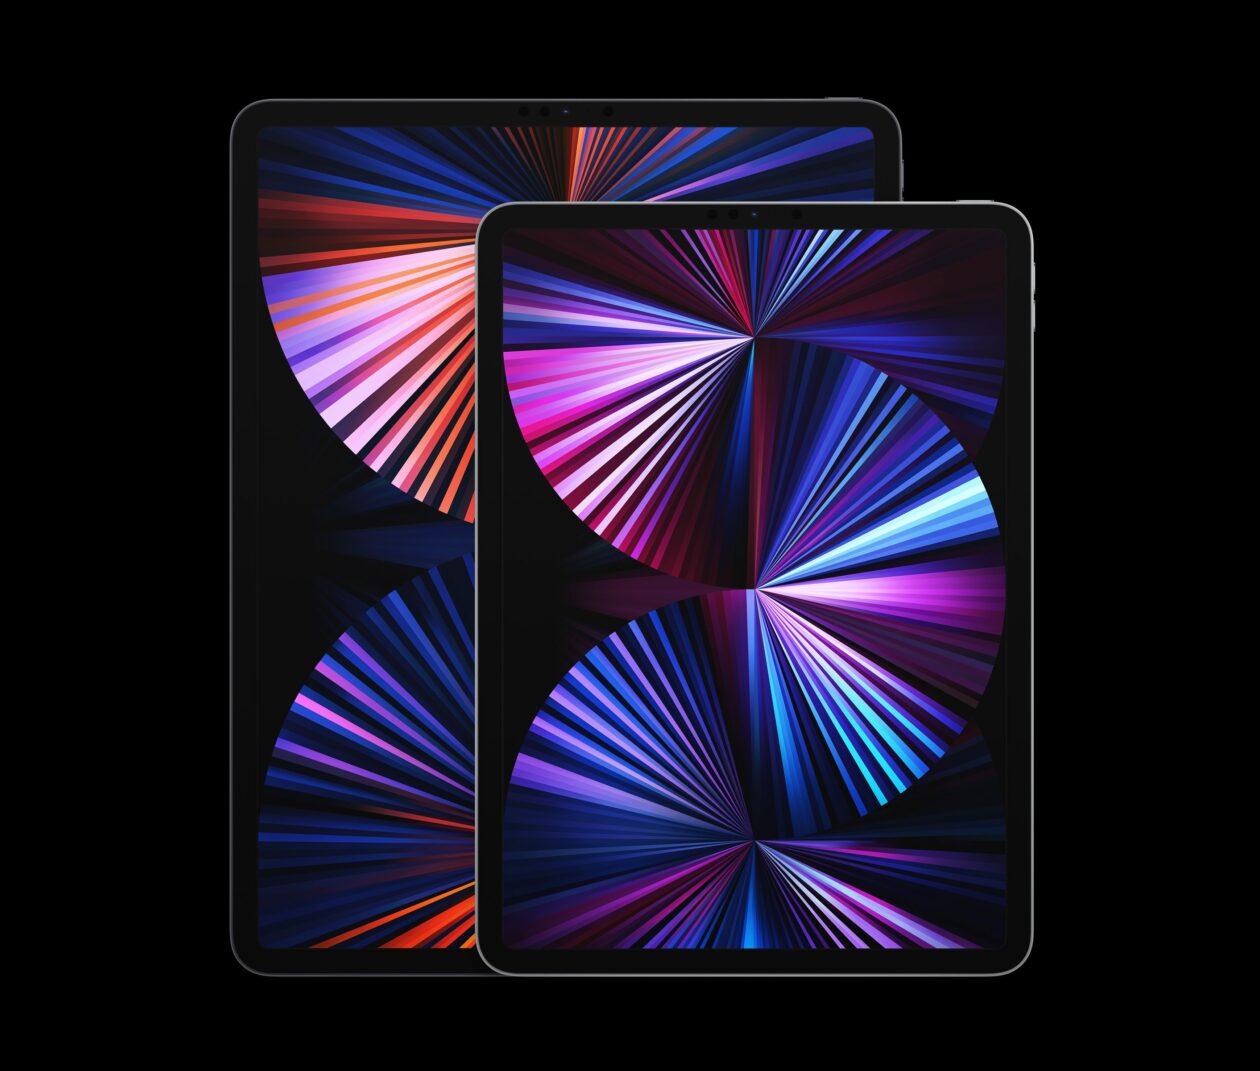 Novos iPads Pro